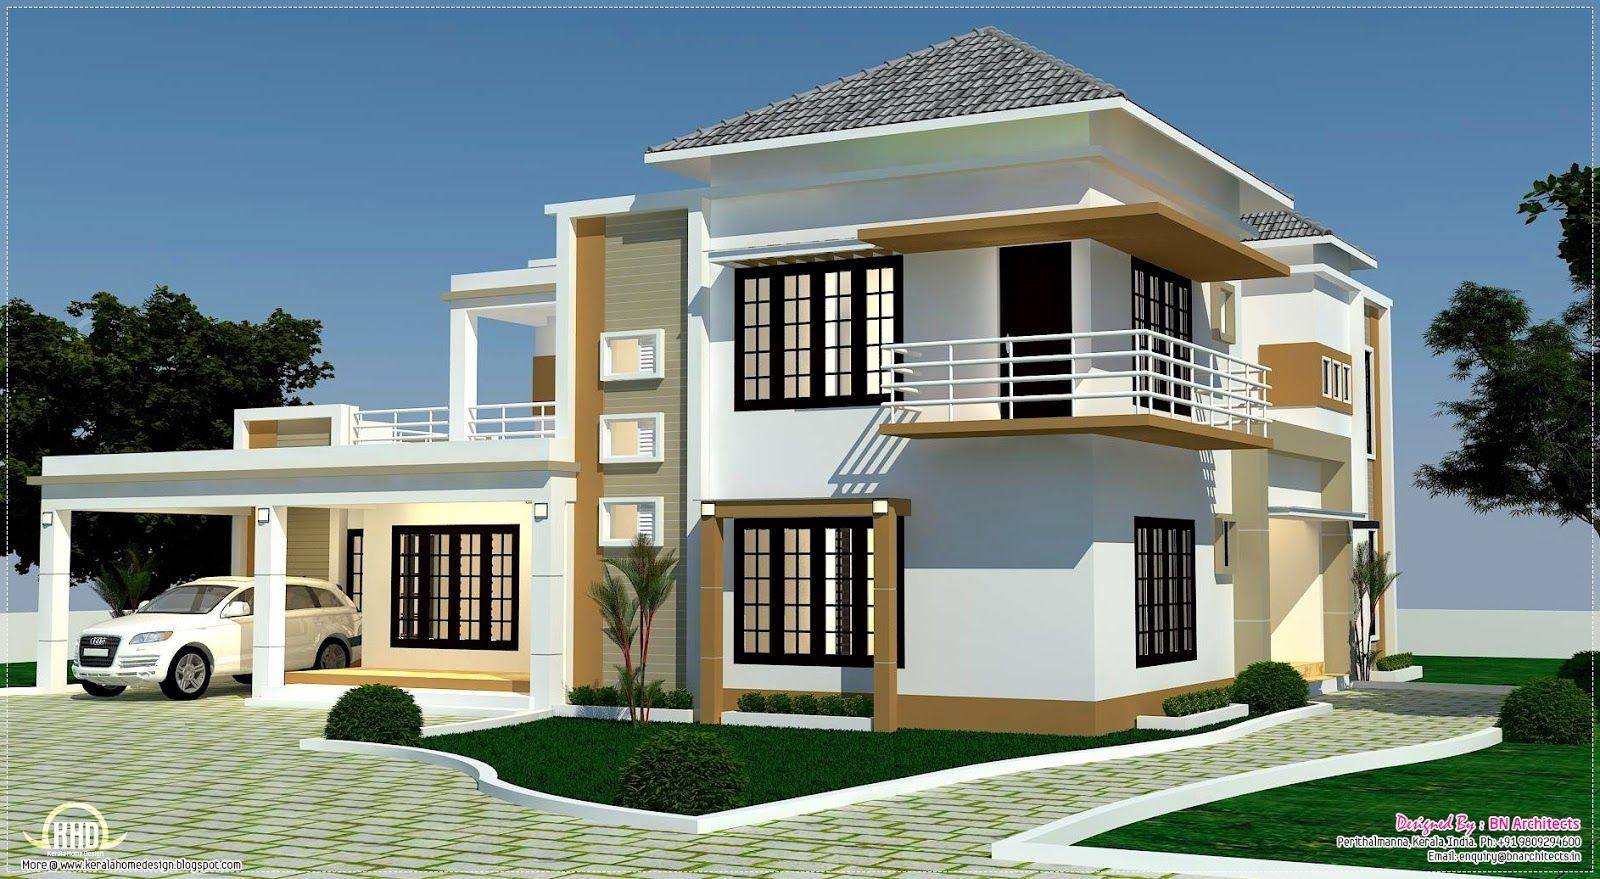 Home Design 3D View